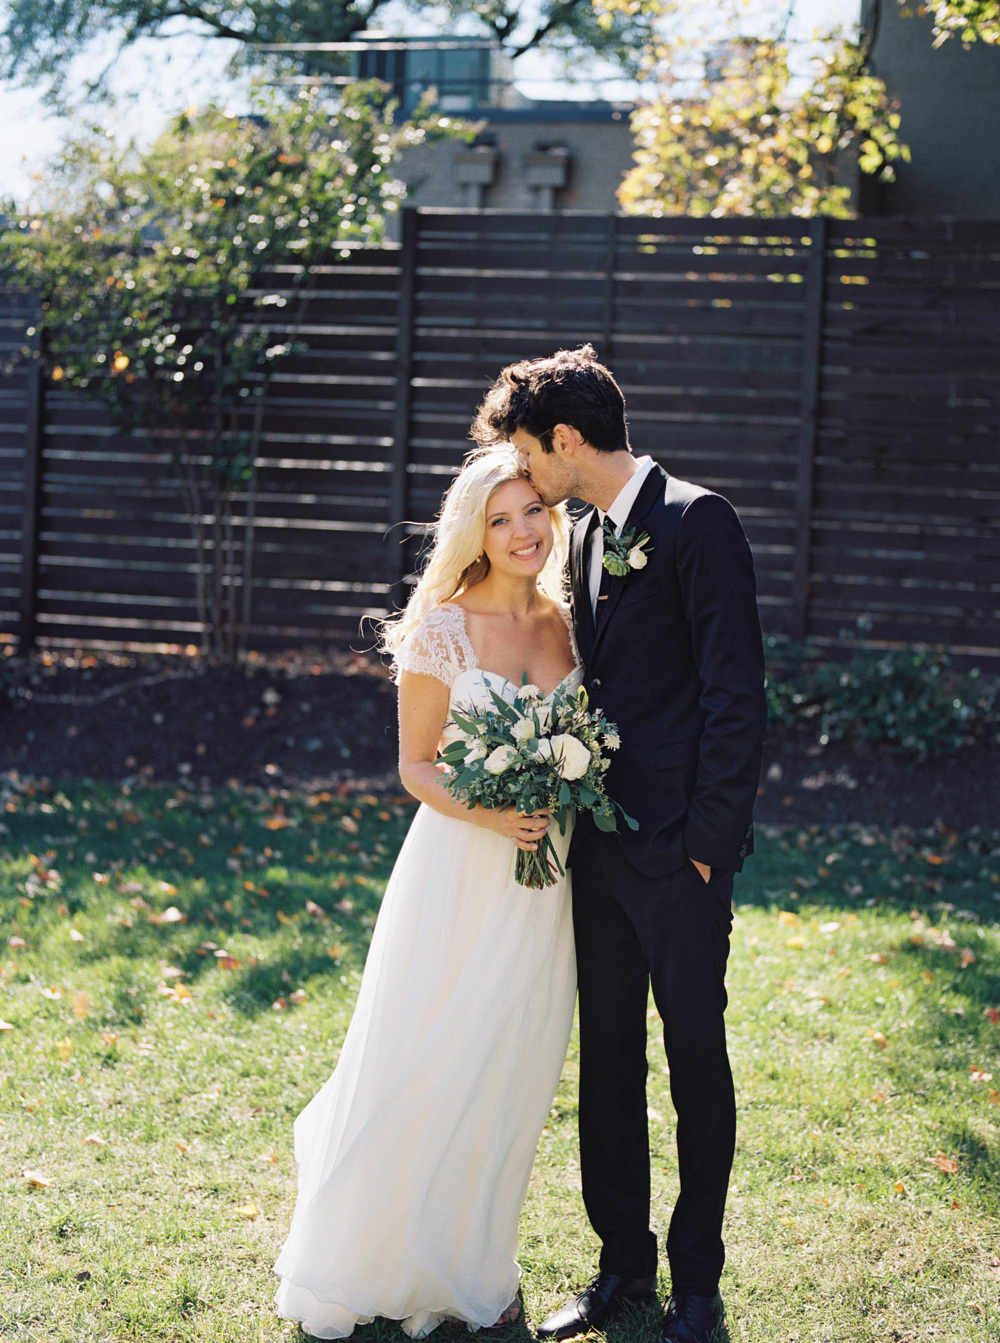 Josh mcneil wedding